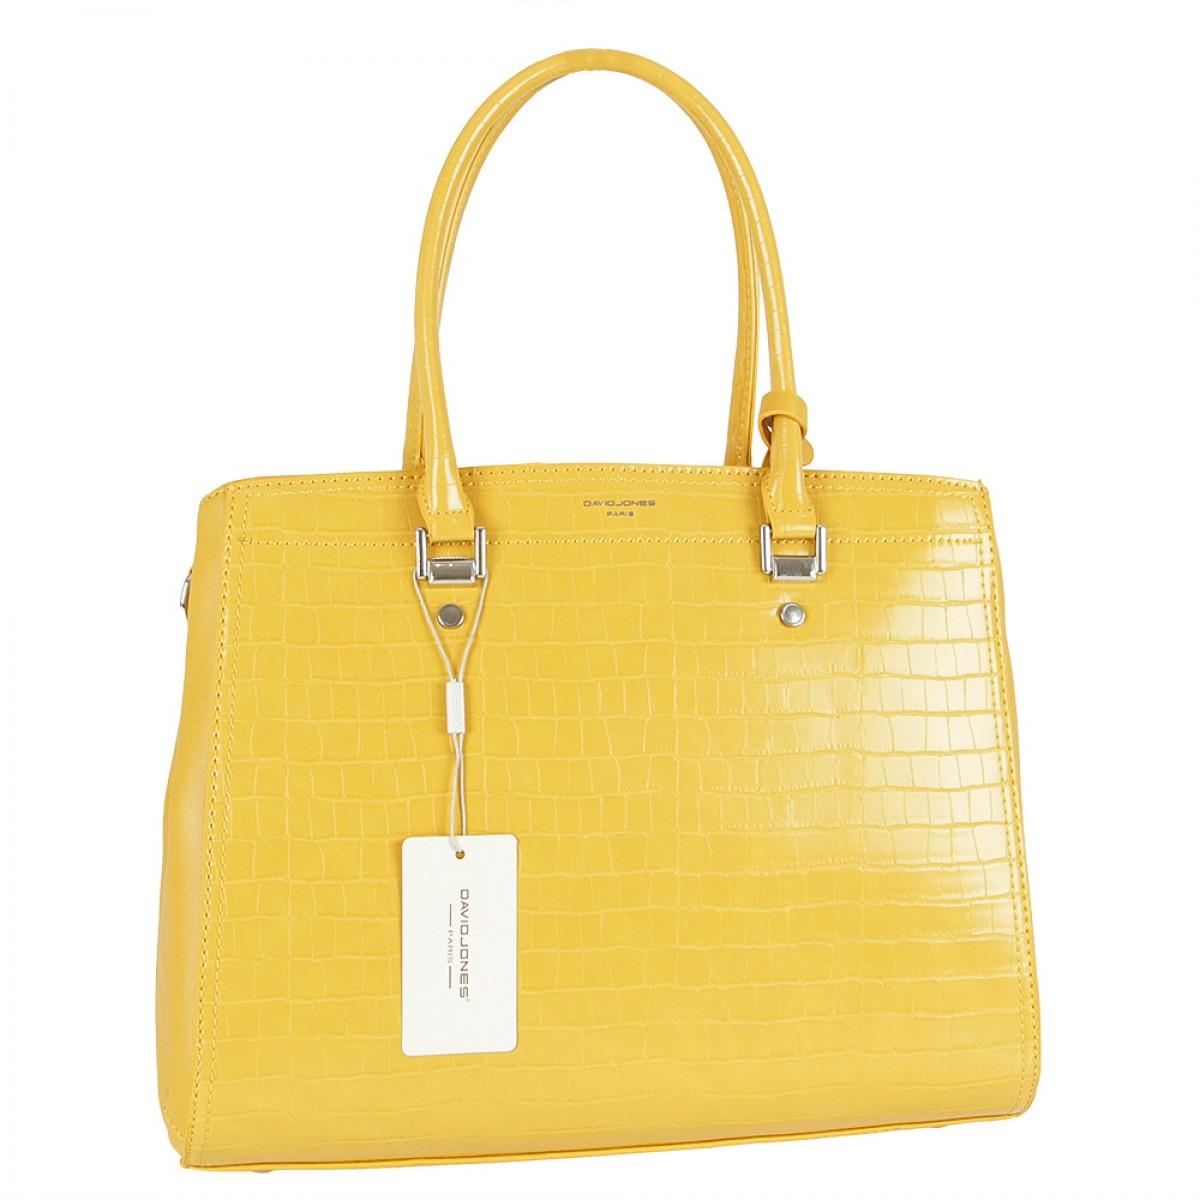 Жіноча сумка David Jones 6148-4 MUSTARD